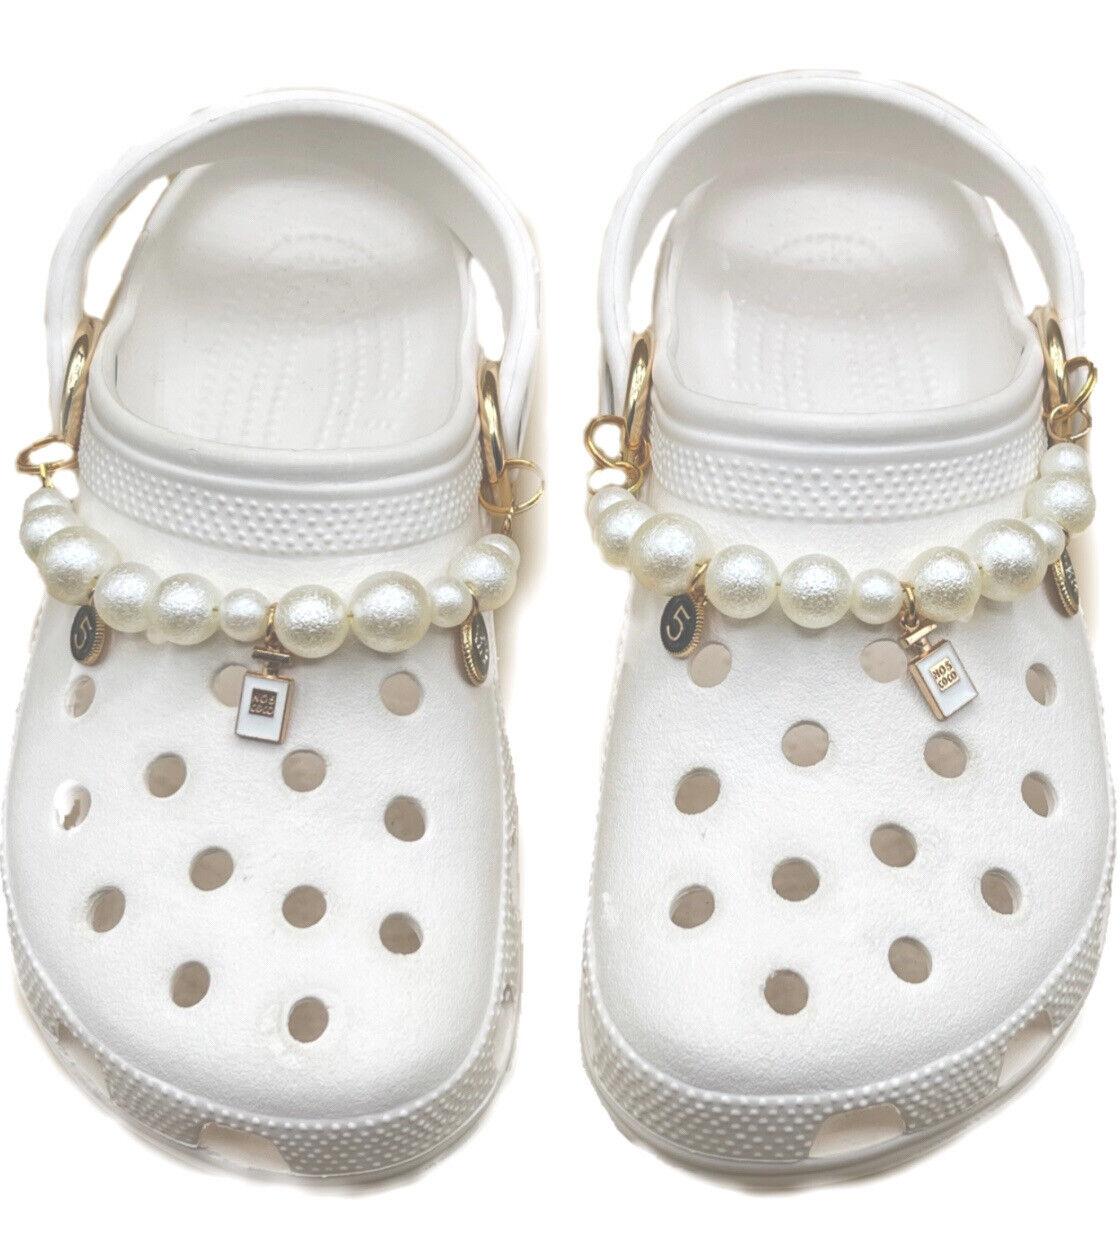 White Pearl Designer Crocs Chain Charms Or Similar Shoe. Shoe Chain Charm